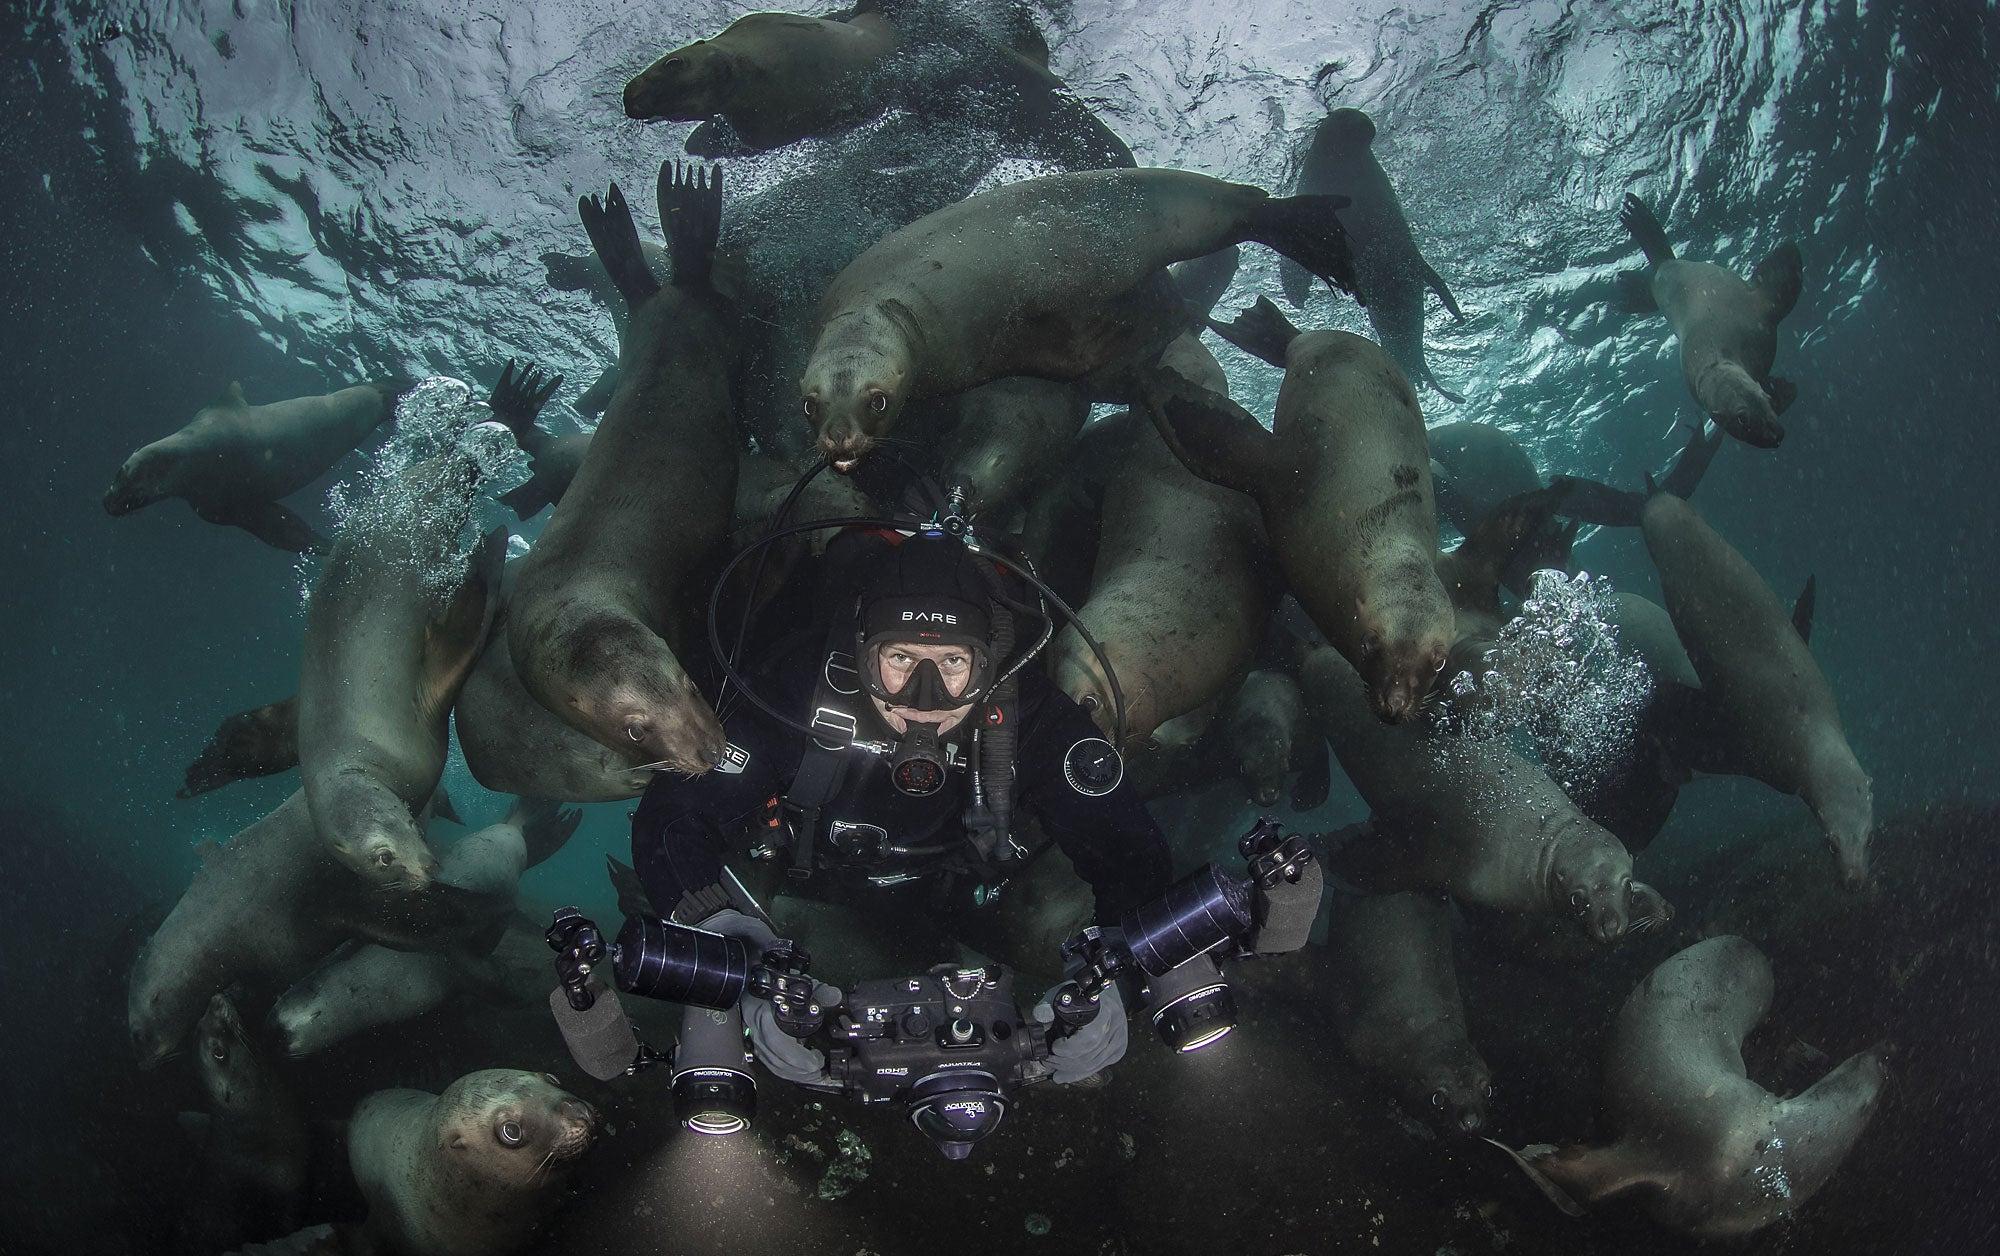 Sea lions swarm a diver